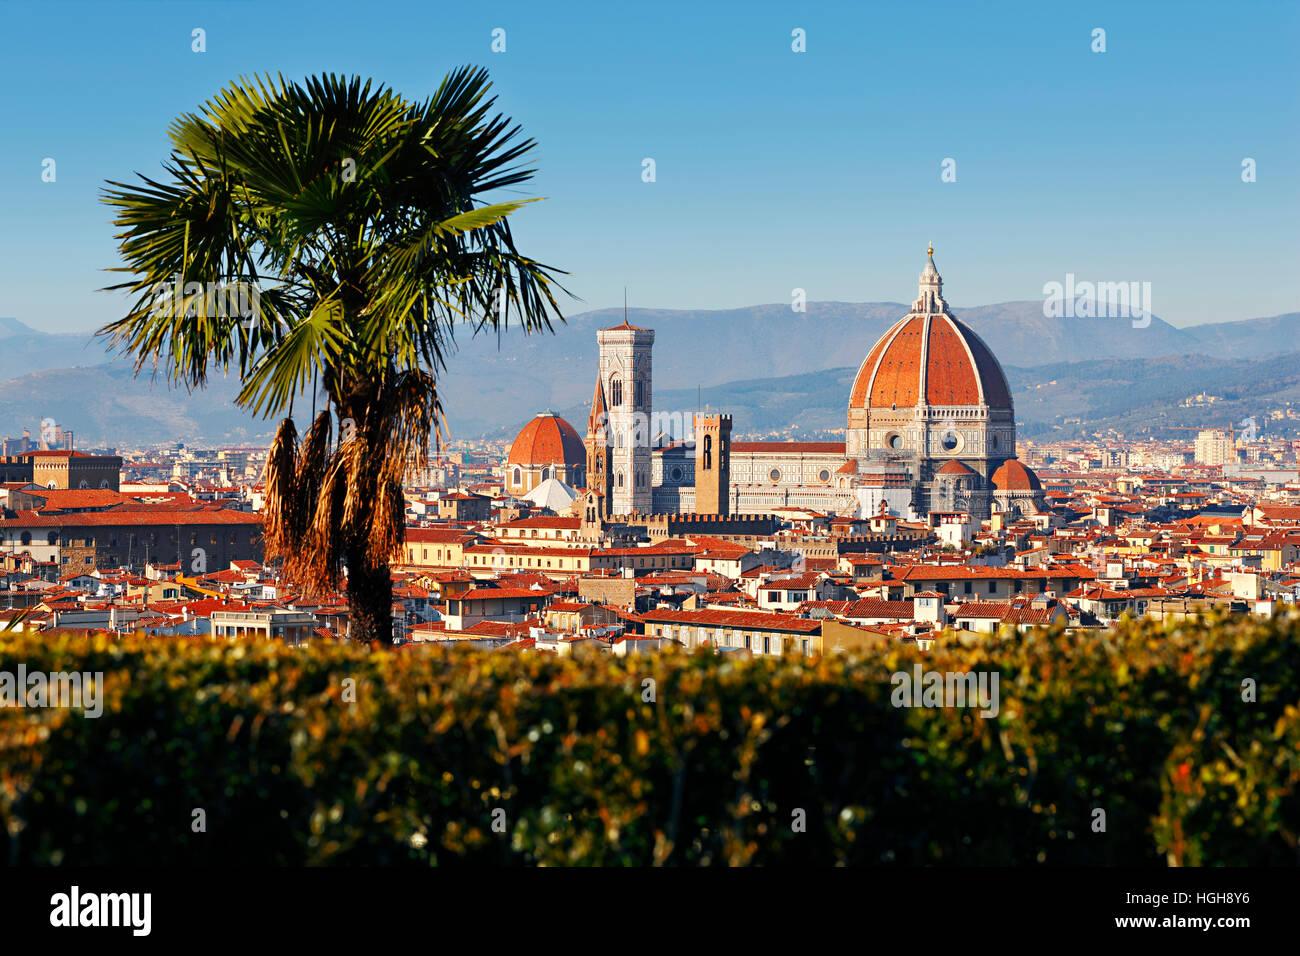 Florence, cattedrale di Santa Maria del Fiore in Tuscany, Italy - Stock Image